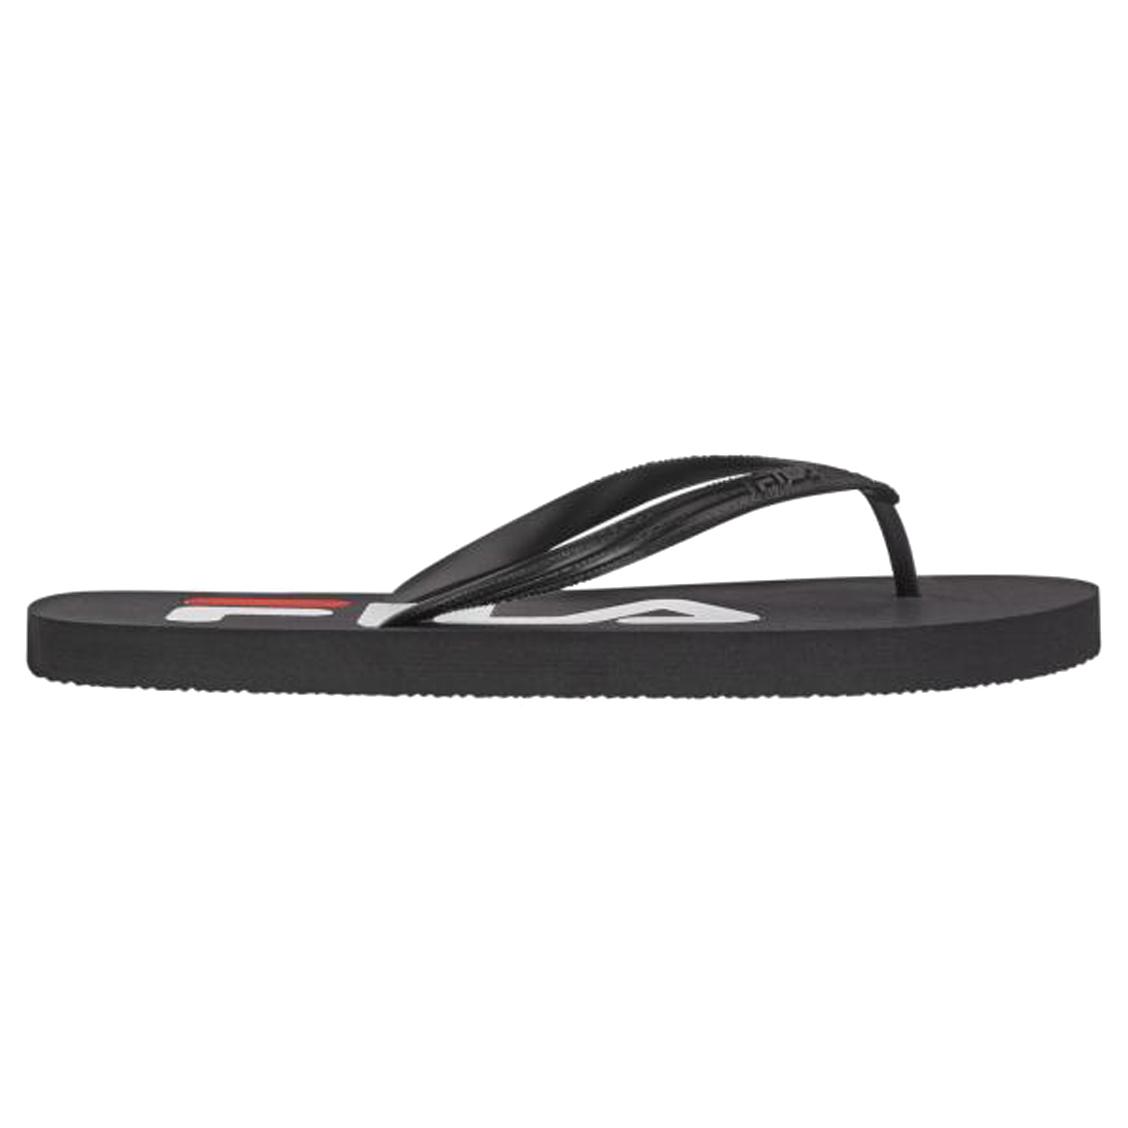 Tongs  troy slipper noires